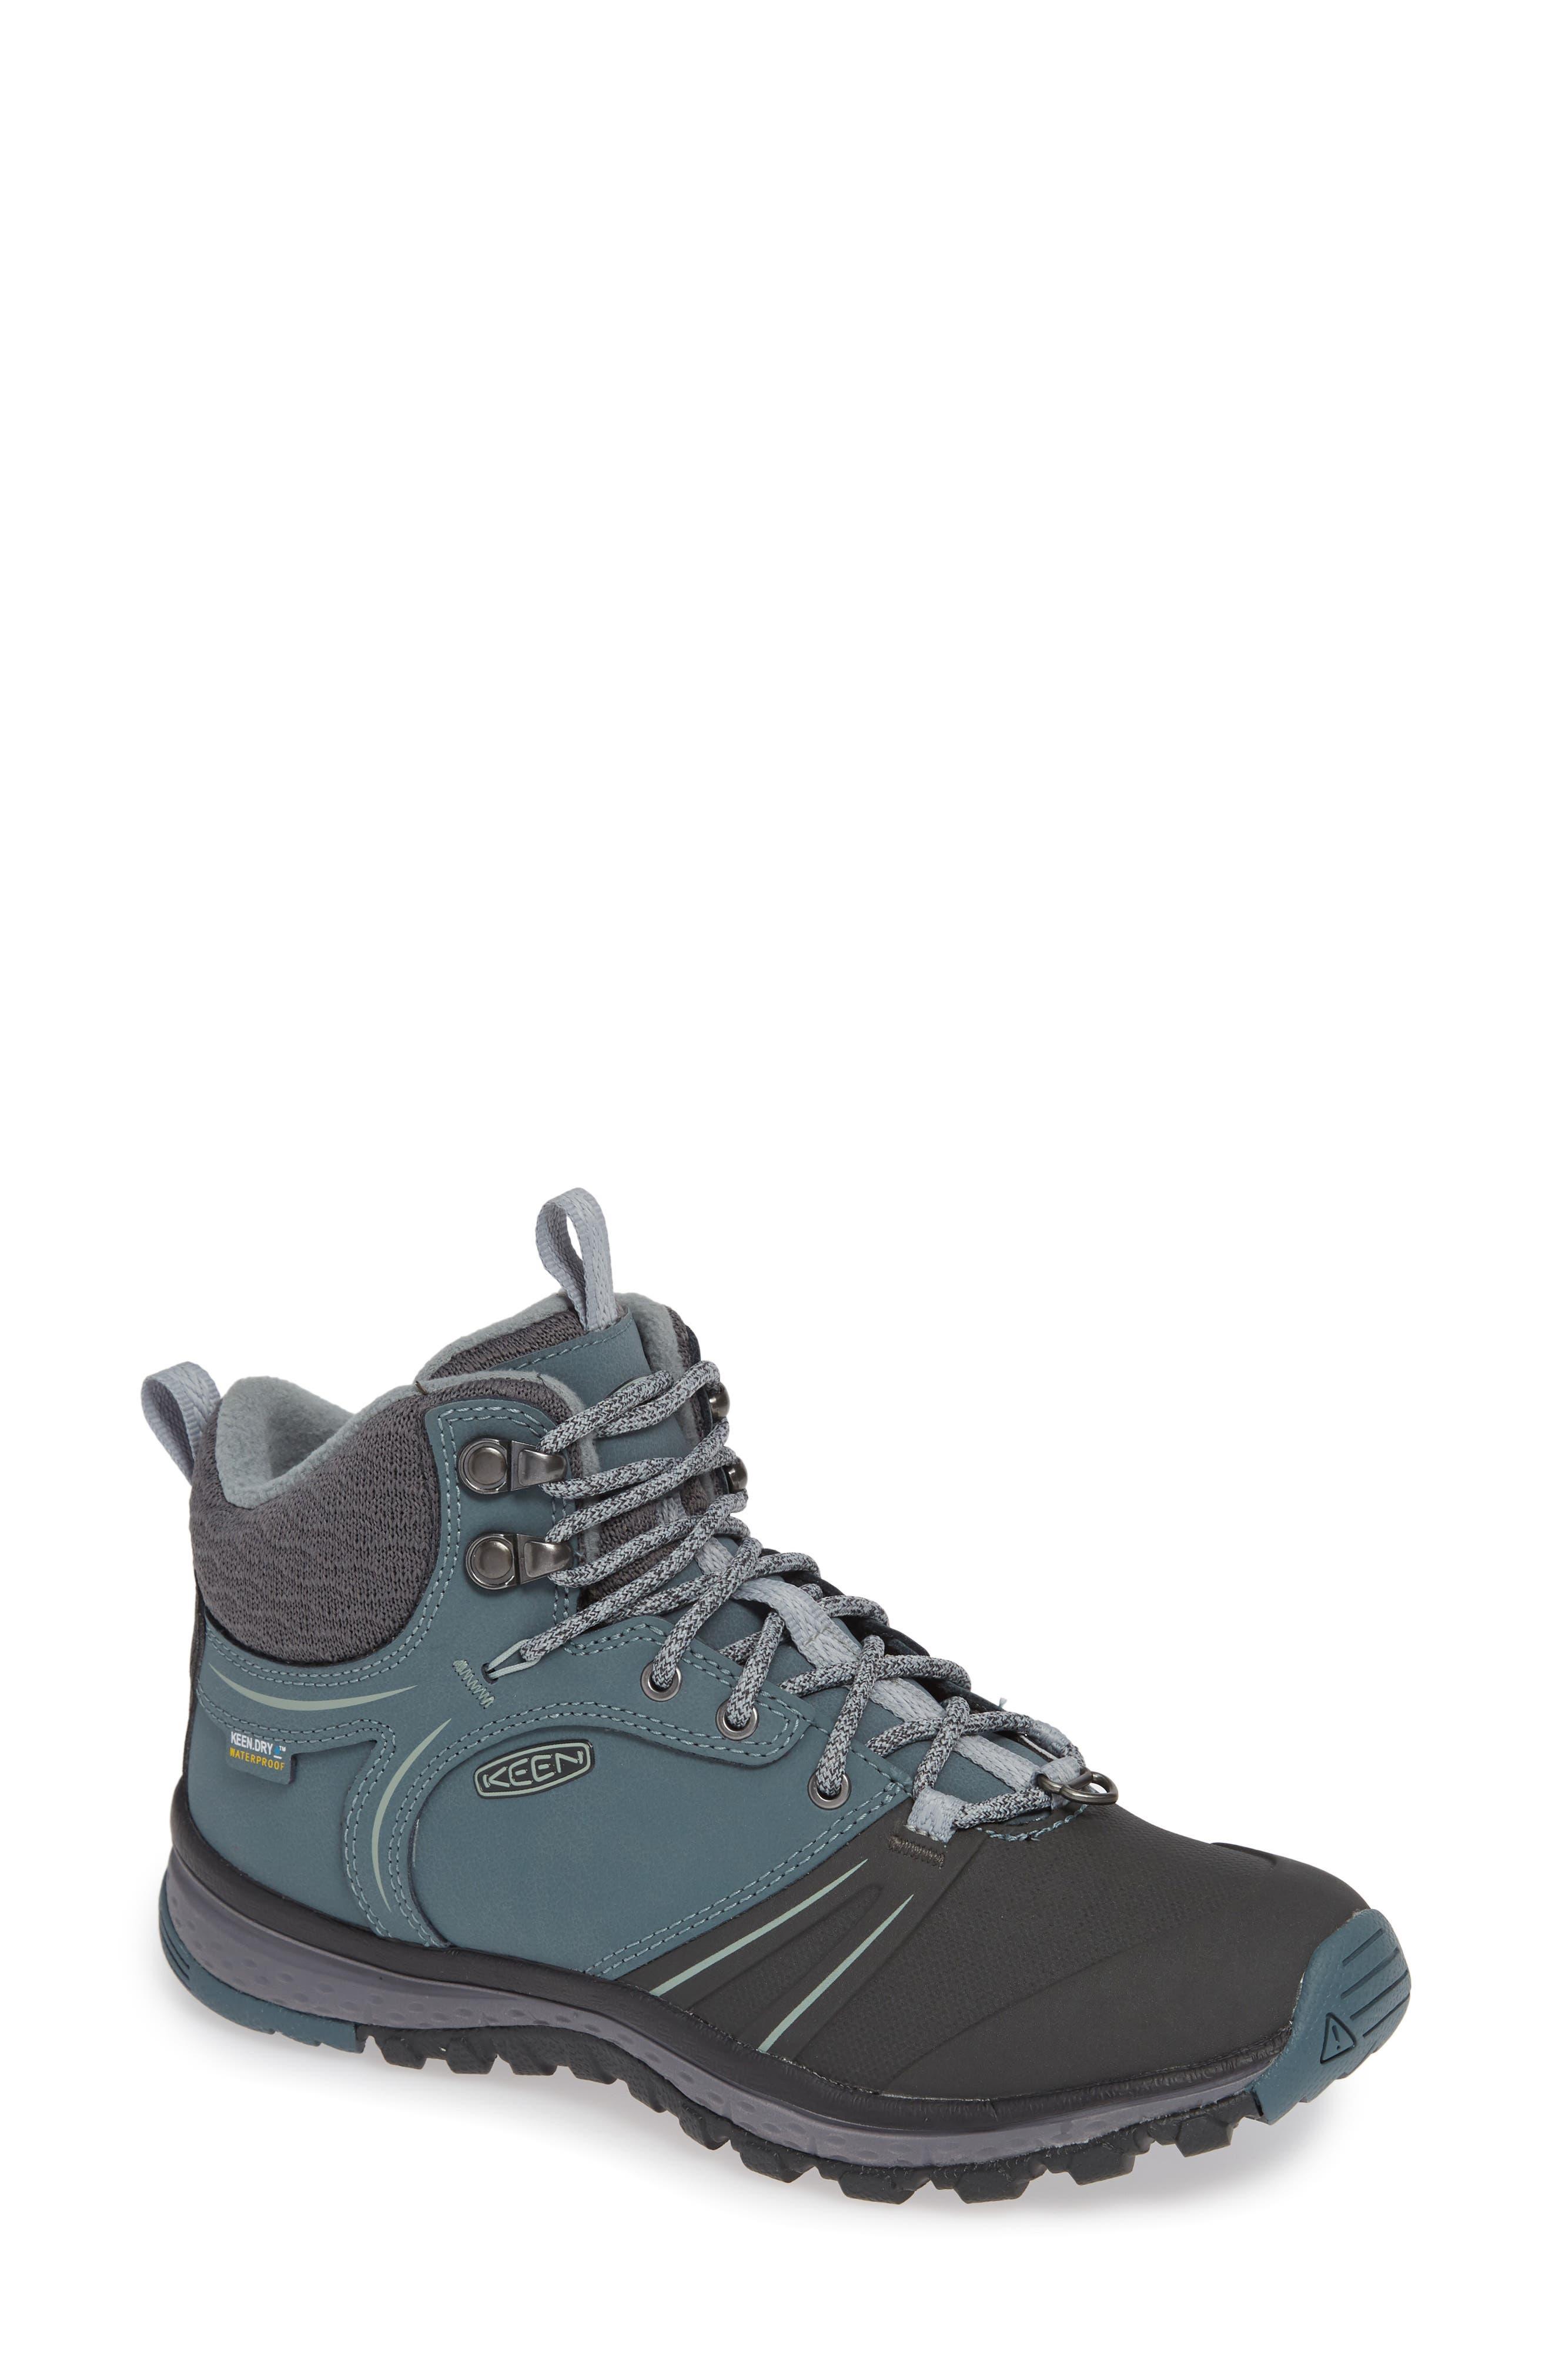 Keen Terradora Wintershell Waterproof Hiking Boot- Grey